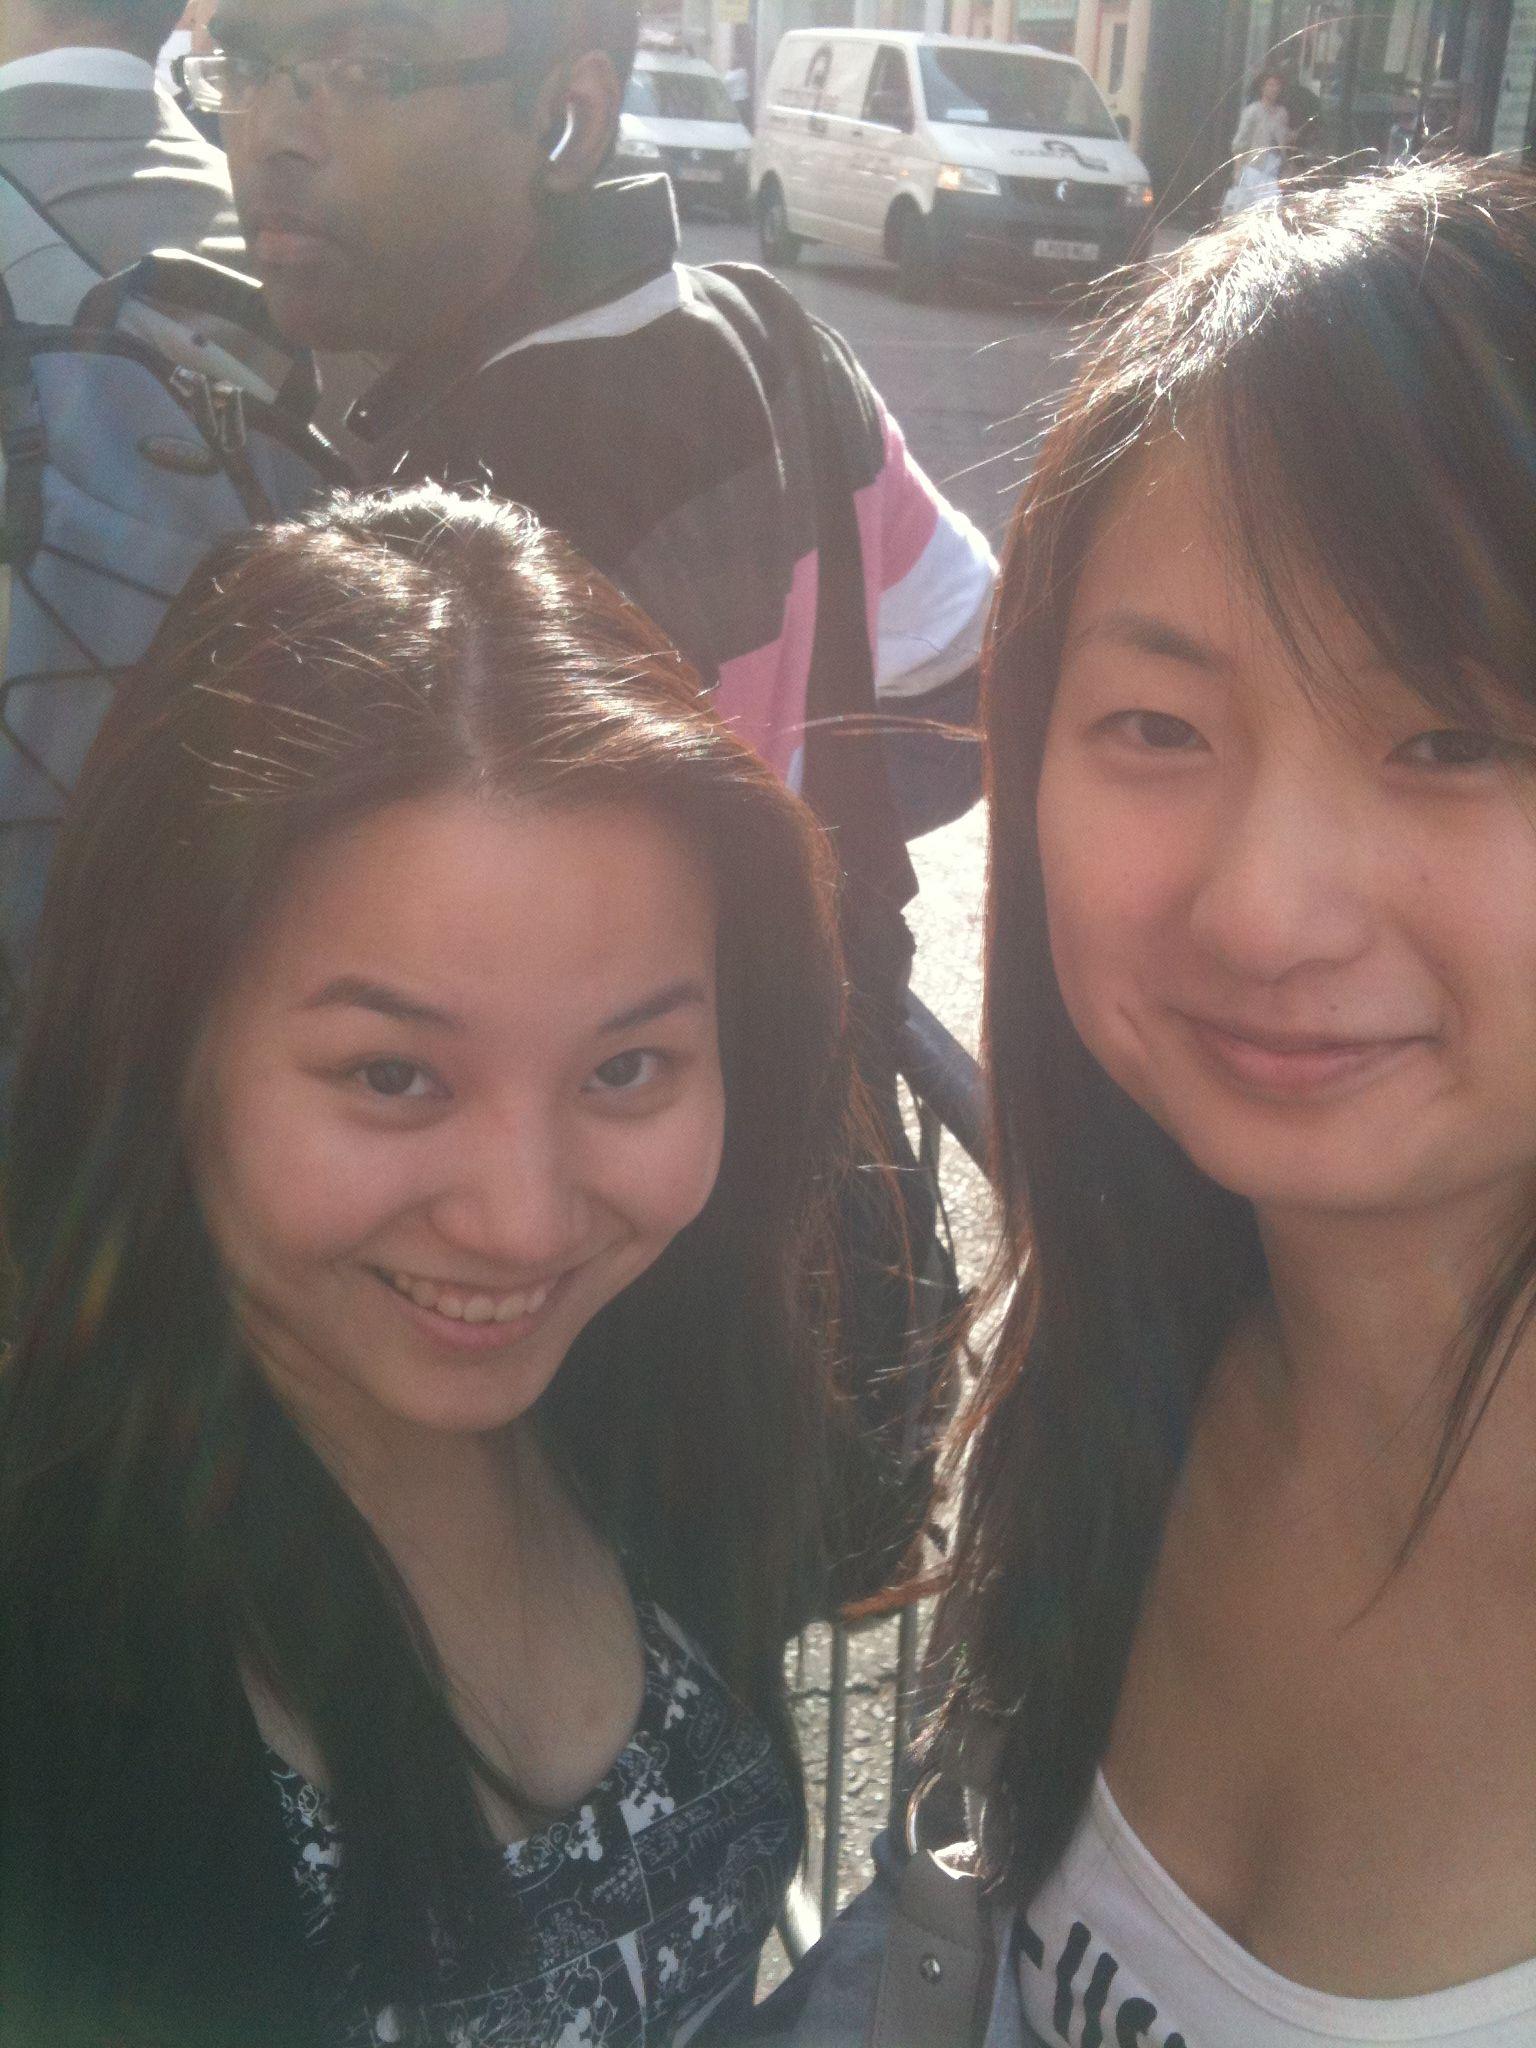 Angela (til venstre) og Sha (til høyre) er blant anslagsvis 1500 andre mennesker i Iphone-kø. (Foto: Finn Jarle Kvalheim, mobilbilde)